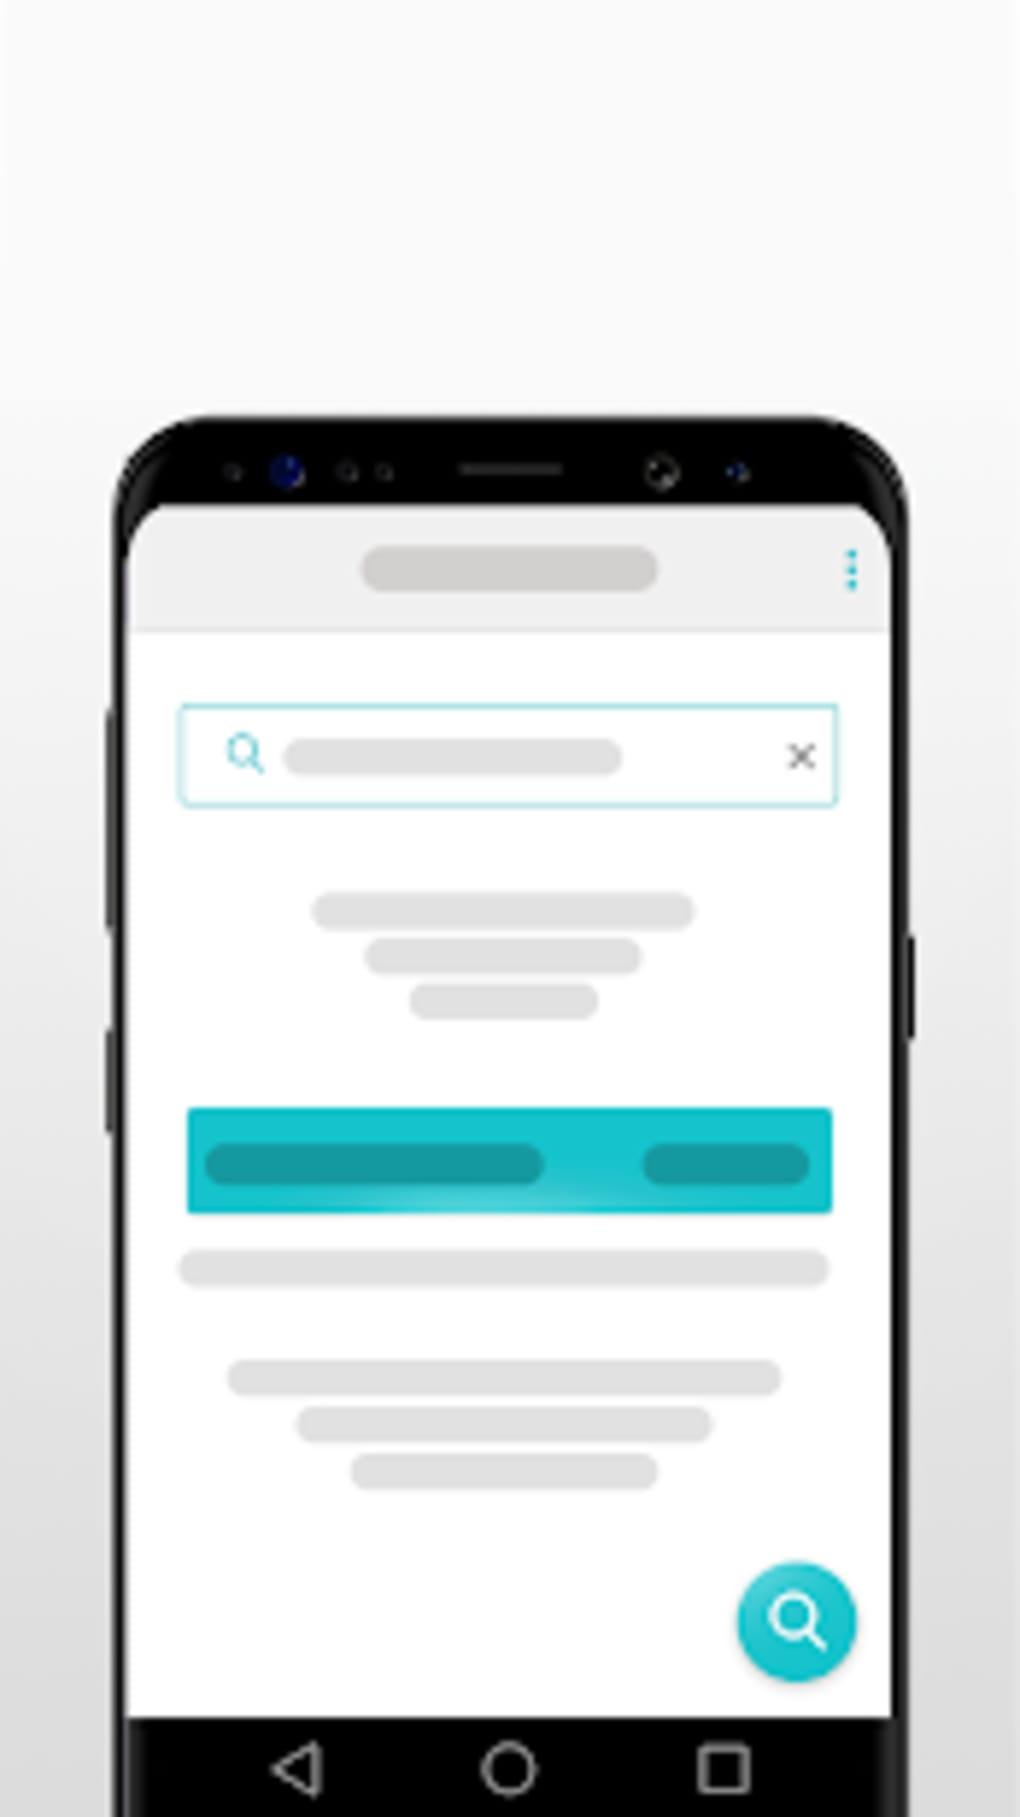 Number Finder for Android - Download